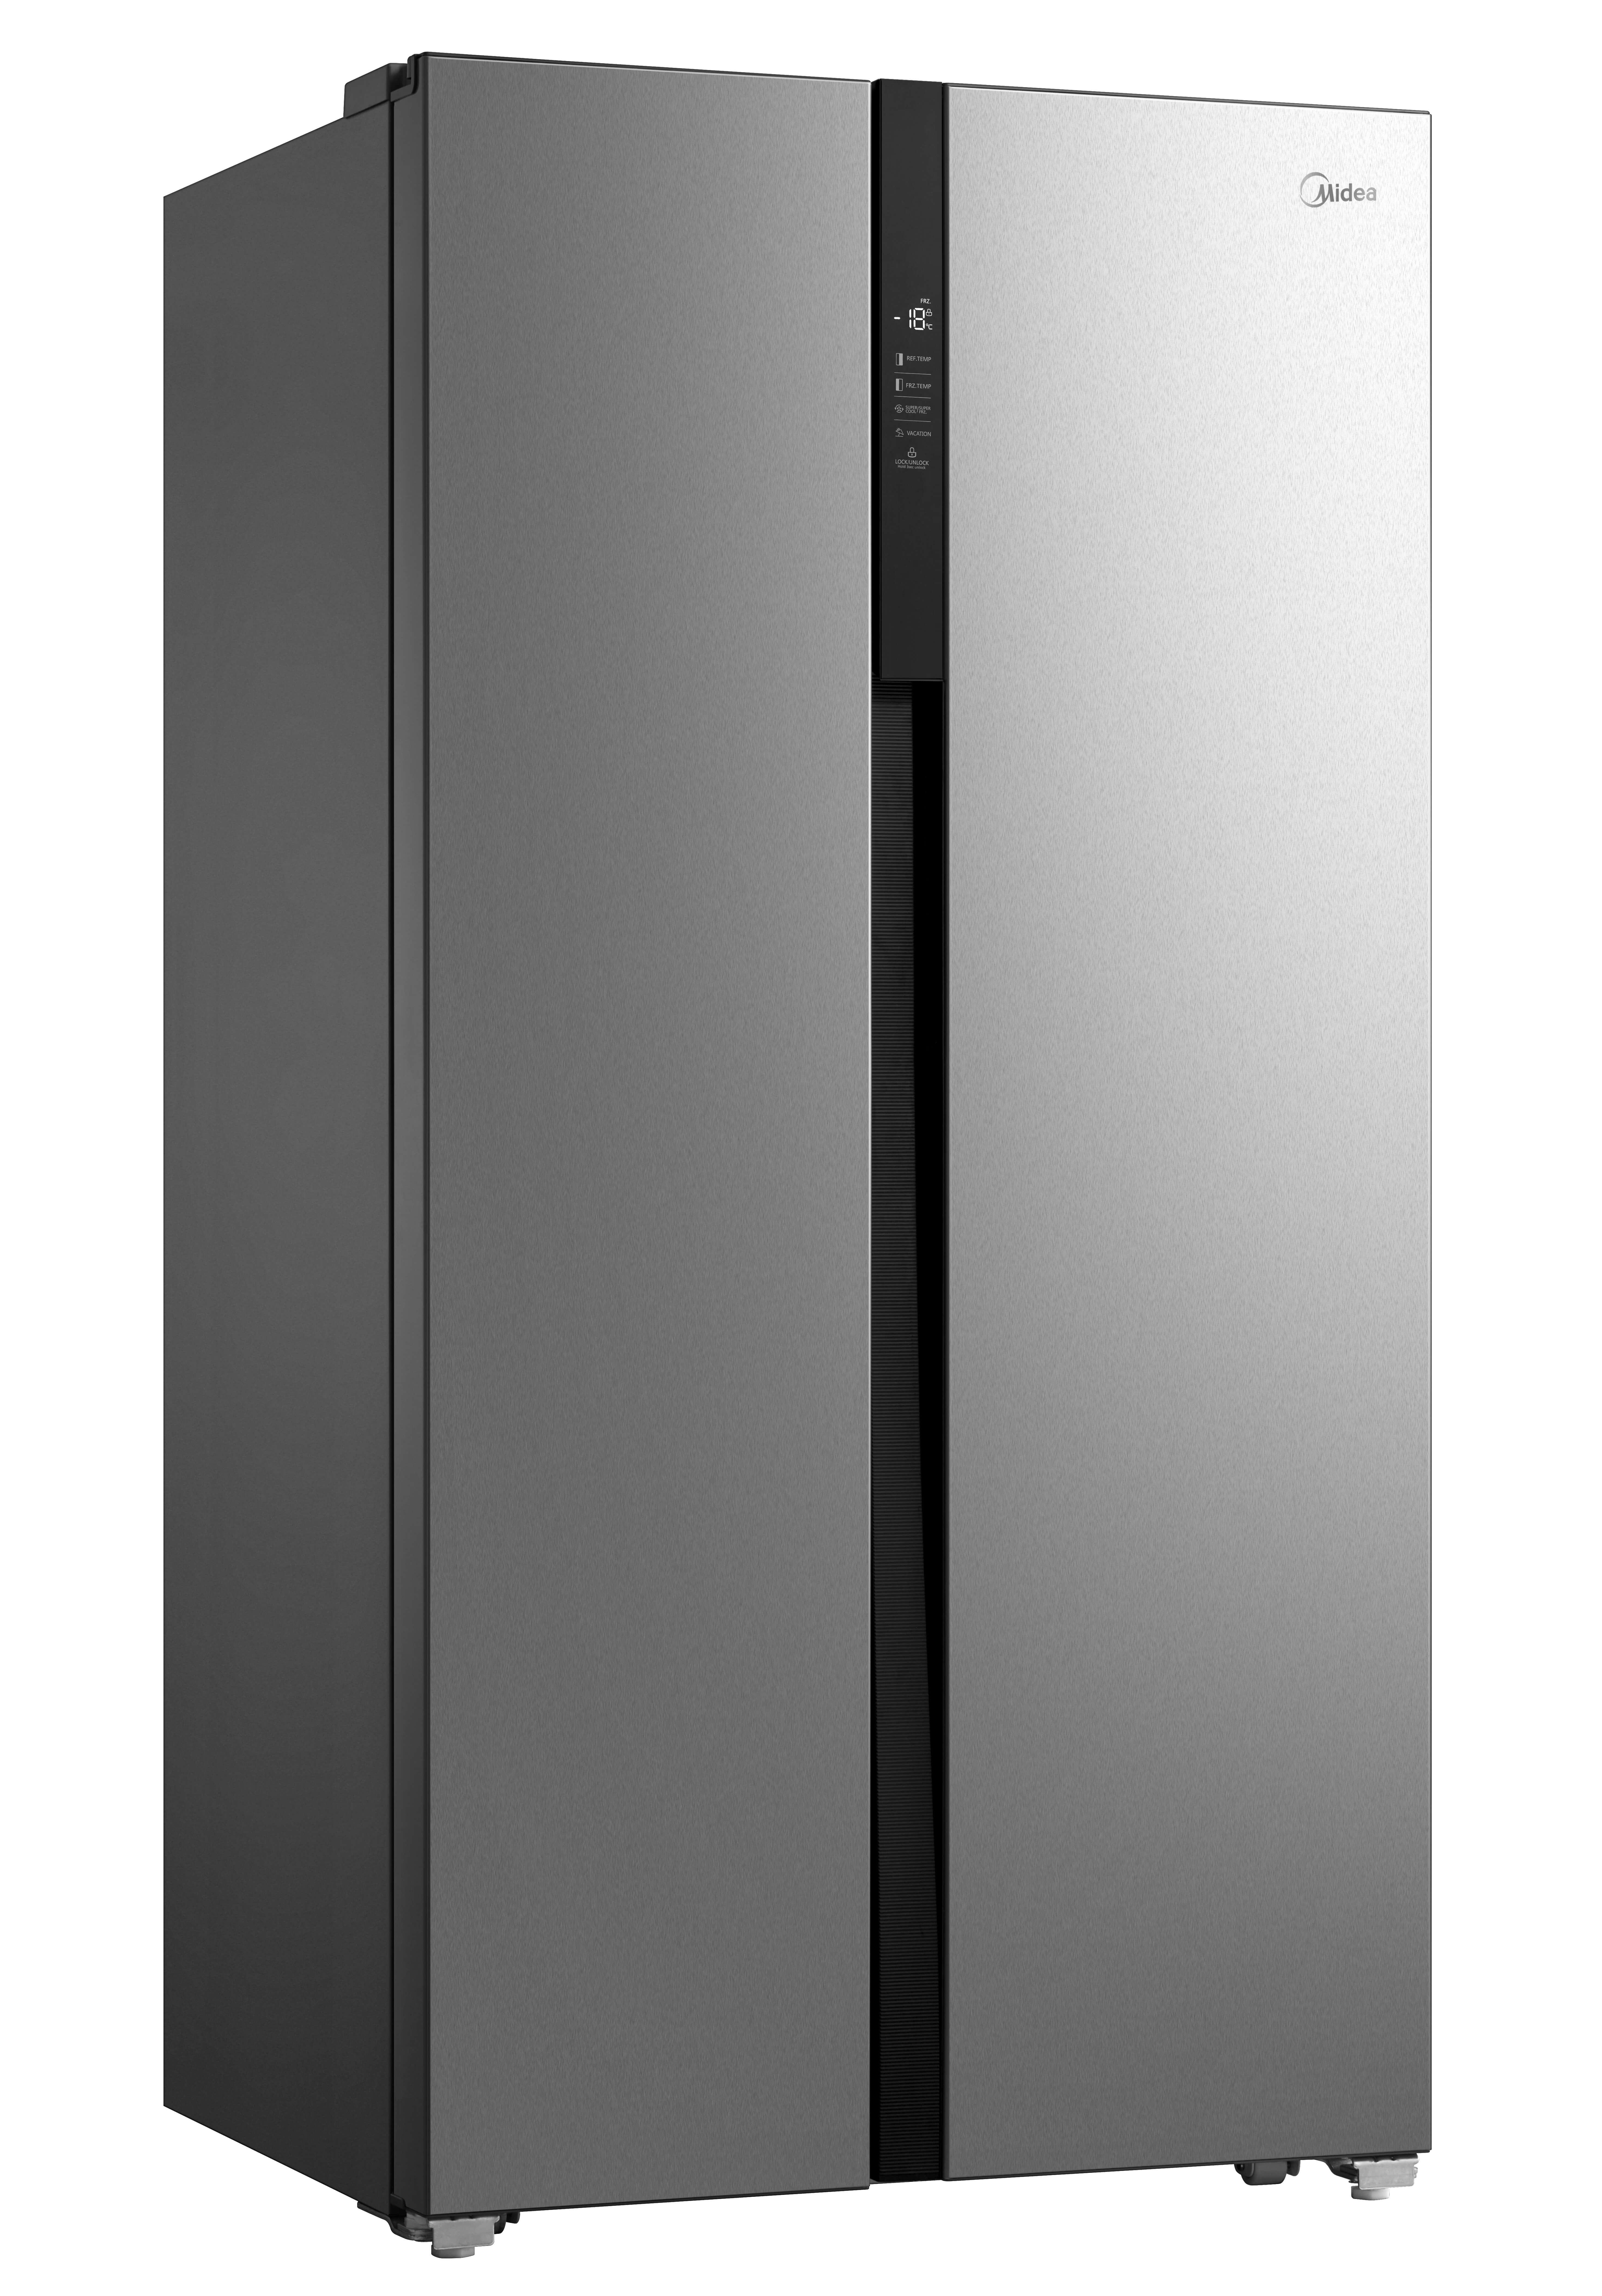 Холодильник Midea MRS518WFNX фото